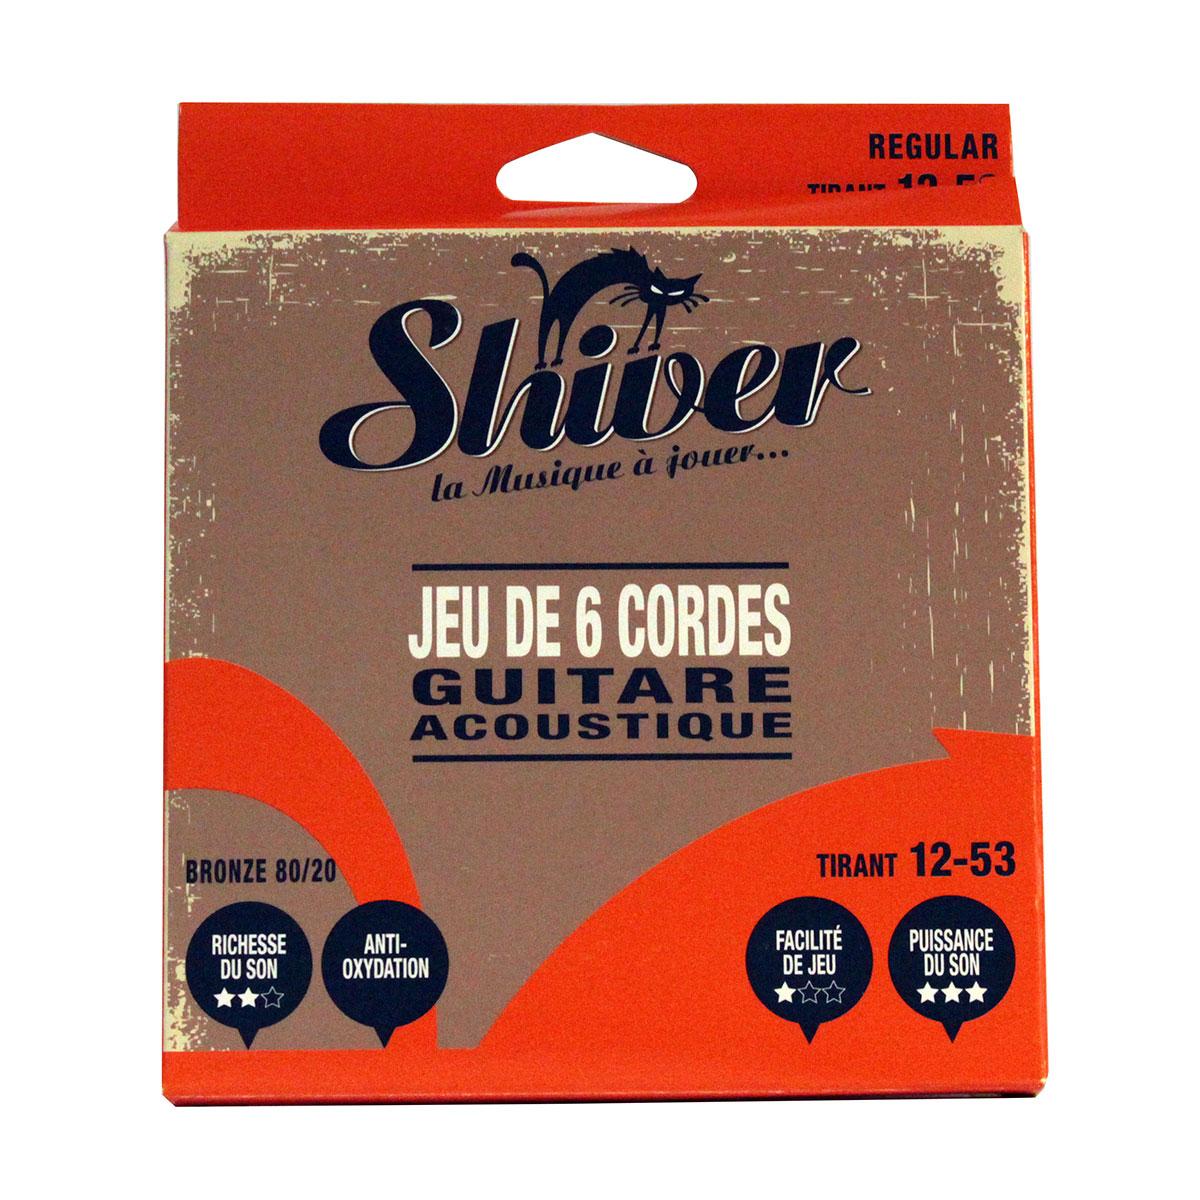 Shiver - Jeu 6 cordes guitare folk 12-53 standard bronze